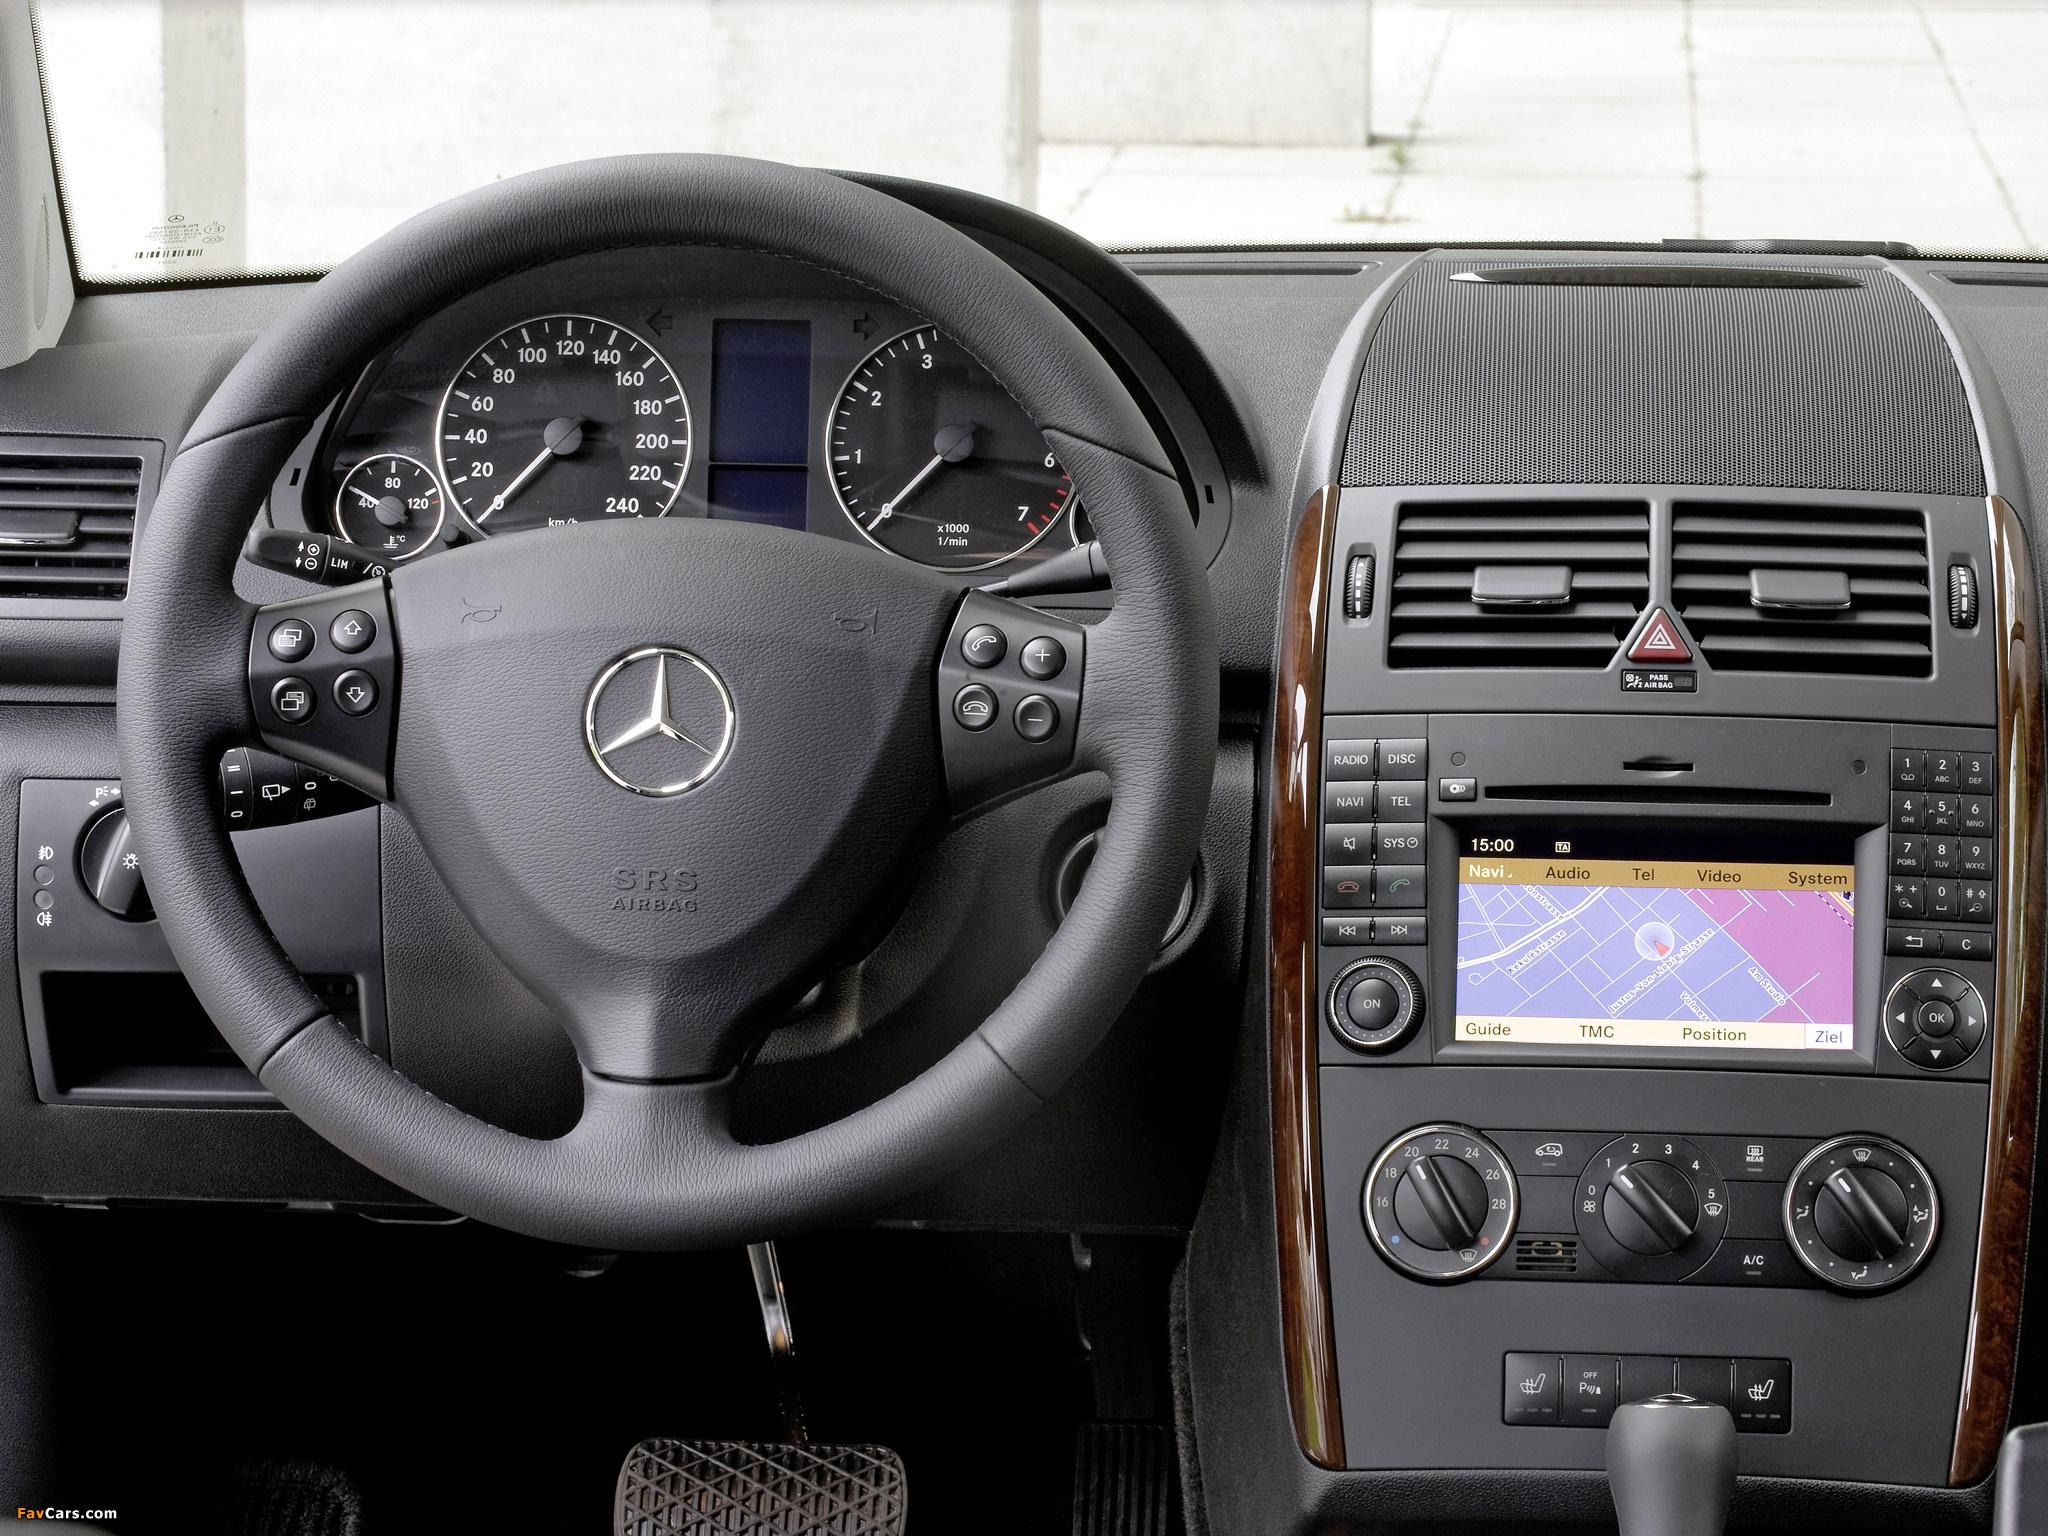 Mercedes-Benz A 170 5-door (W169) 2008 images (2048 x 1536)